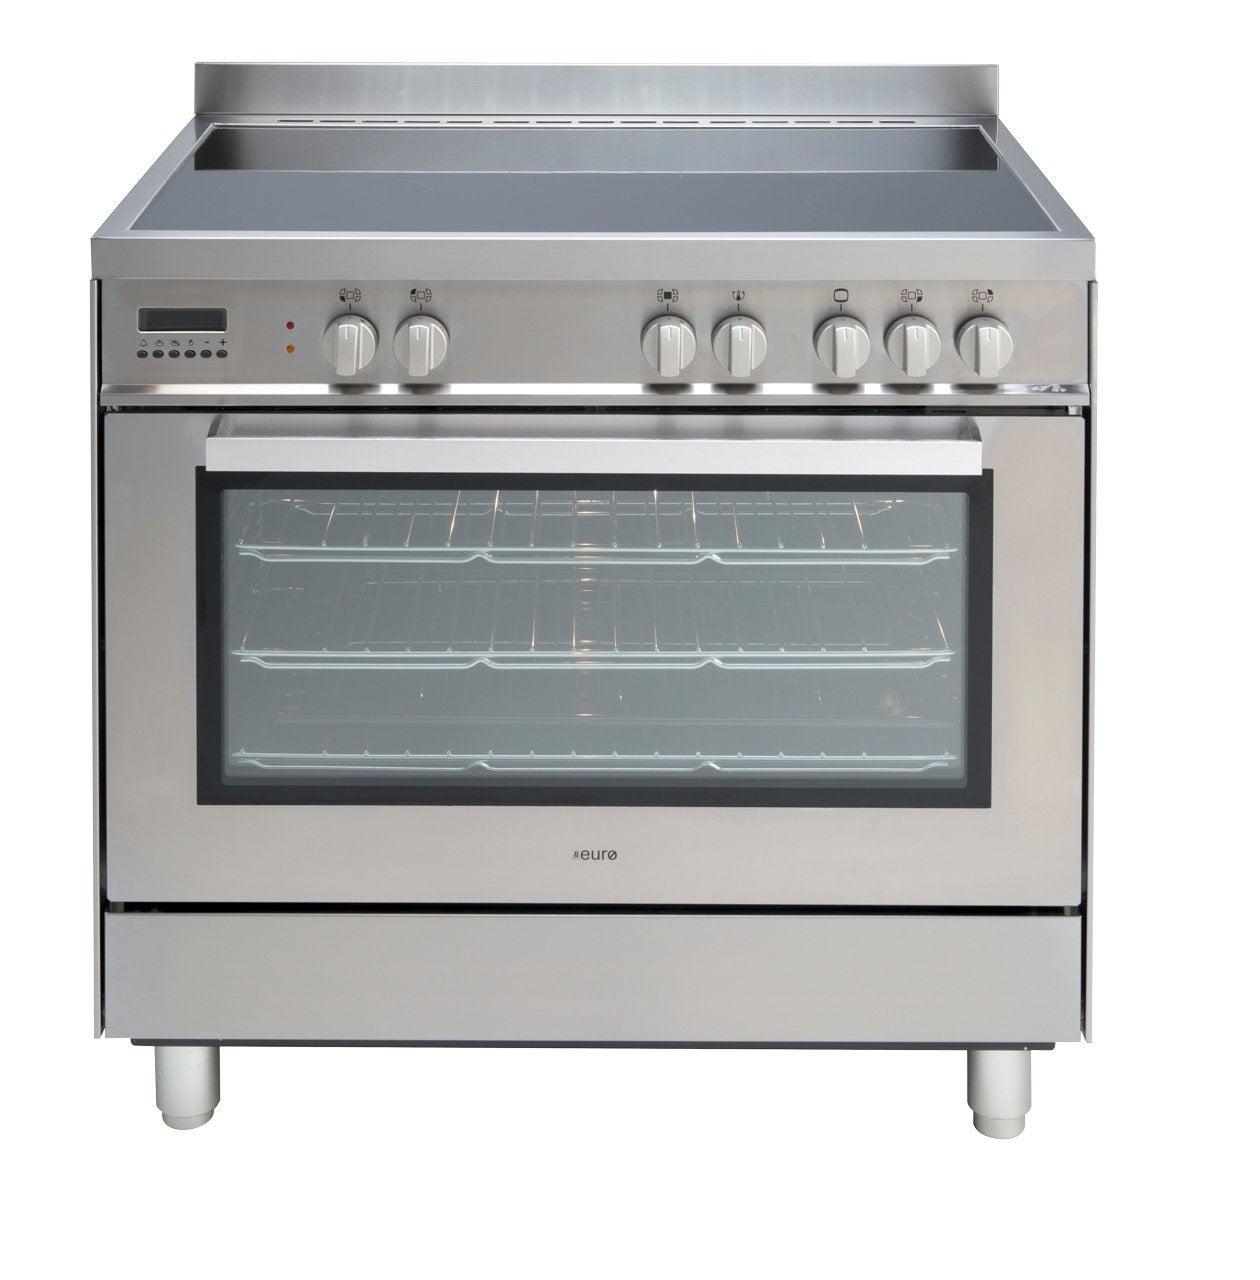 Euro Appliances EFS900EETSX Oven